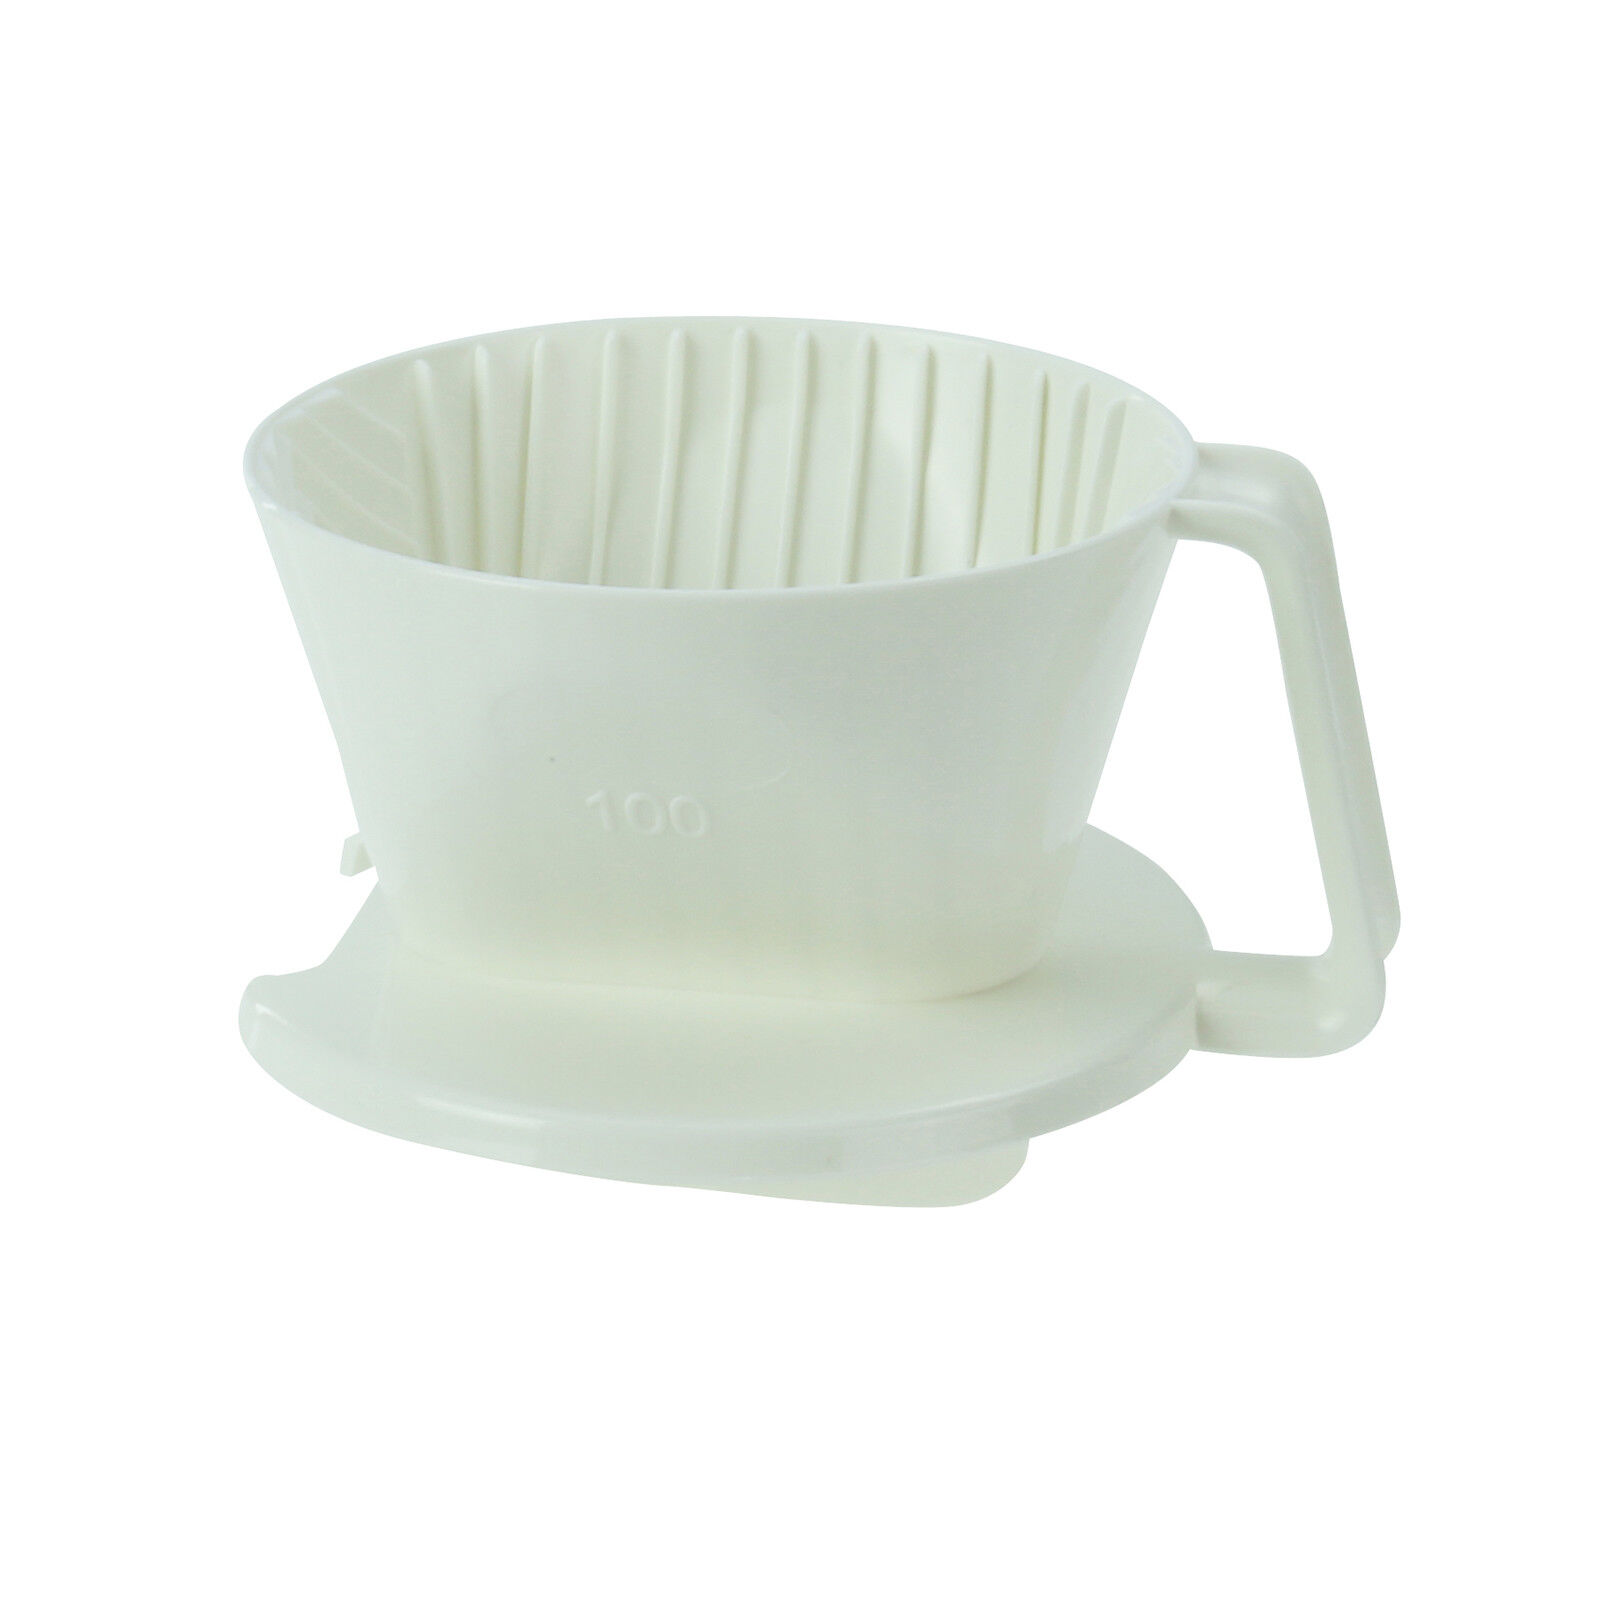 Details About Genuine Melitta Aroma Boy Coffee Machine Filter Holder Brewing Jug Funnel Cone